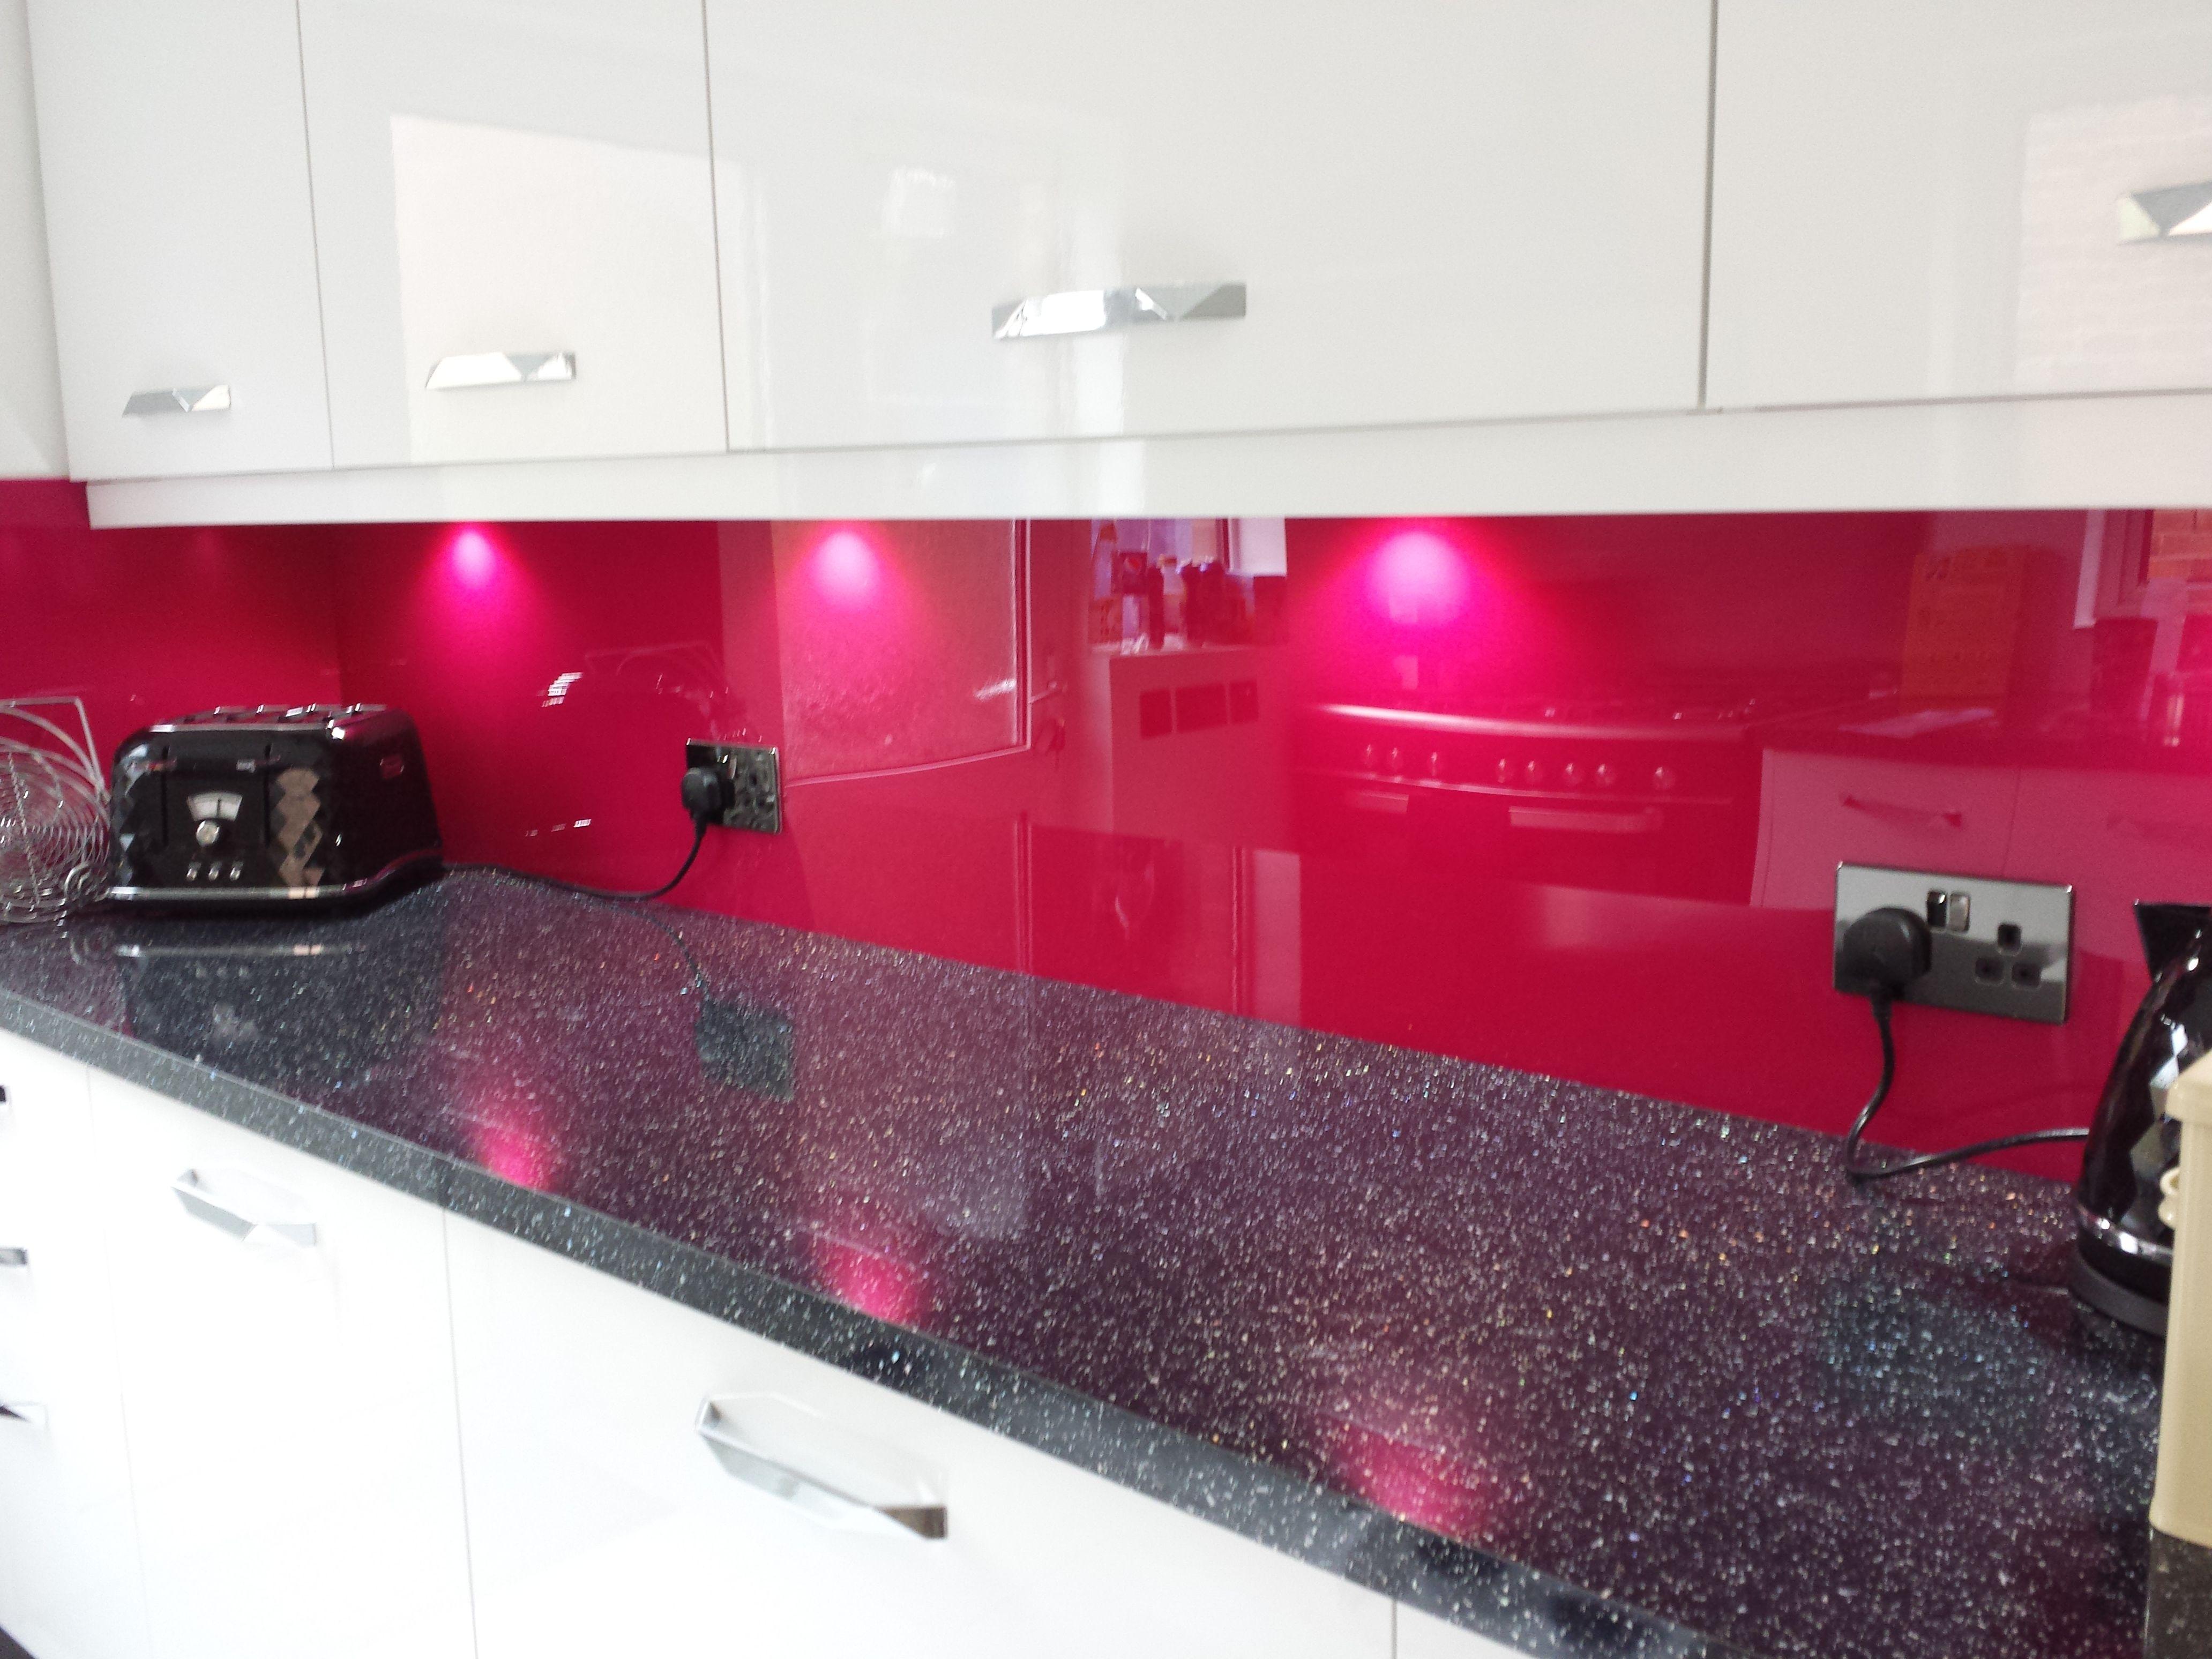 pink back painted glass kitchen splashback supplied and installed by dag inter ltd wwwdagintercom new home pinterest splashback kitchens and - Magenta Kitchen Design